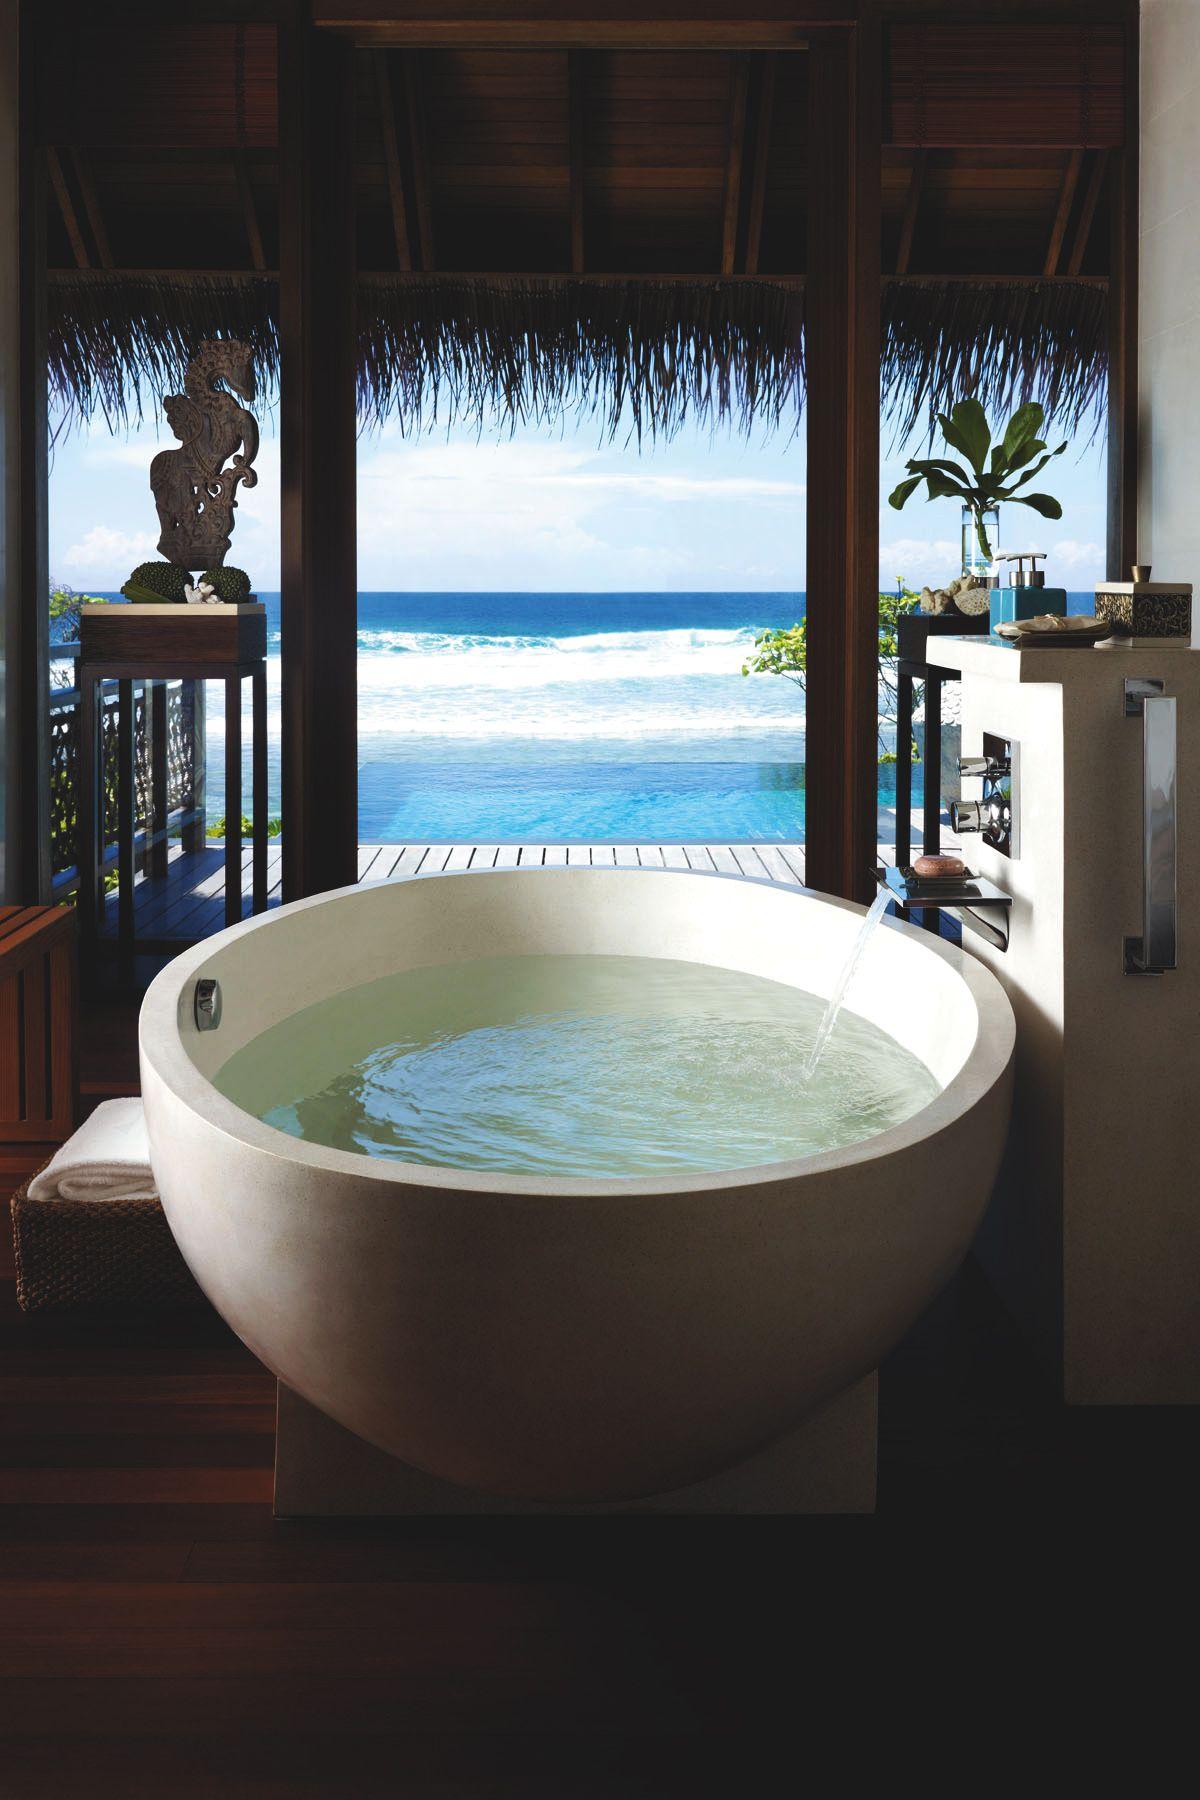 loungeoflust on tumblr: hypnoticgoddessursula your bath is ready